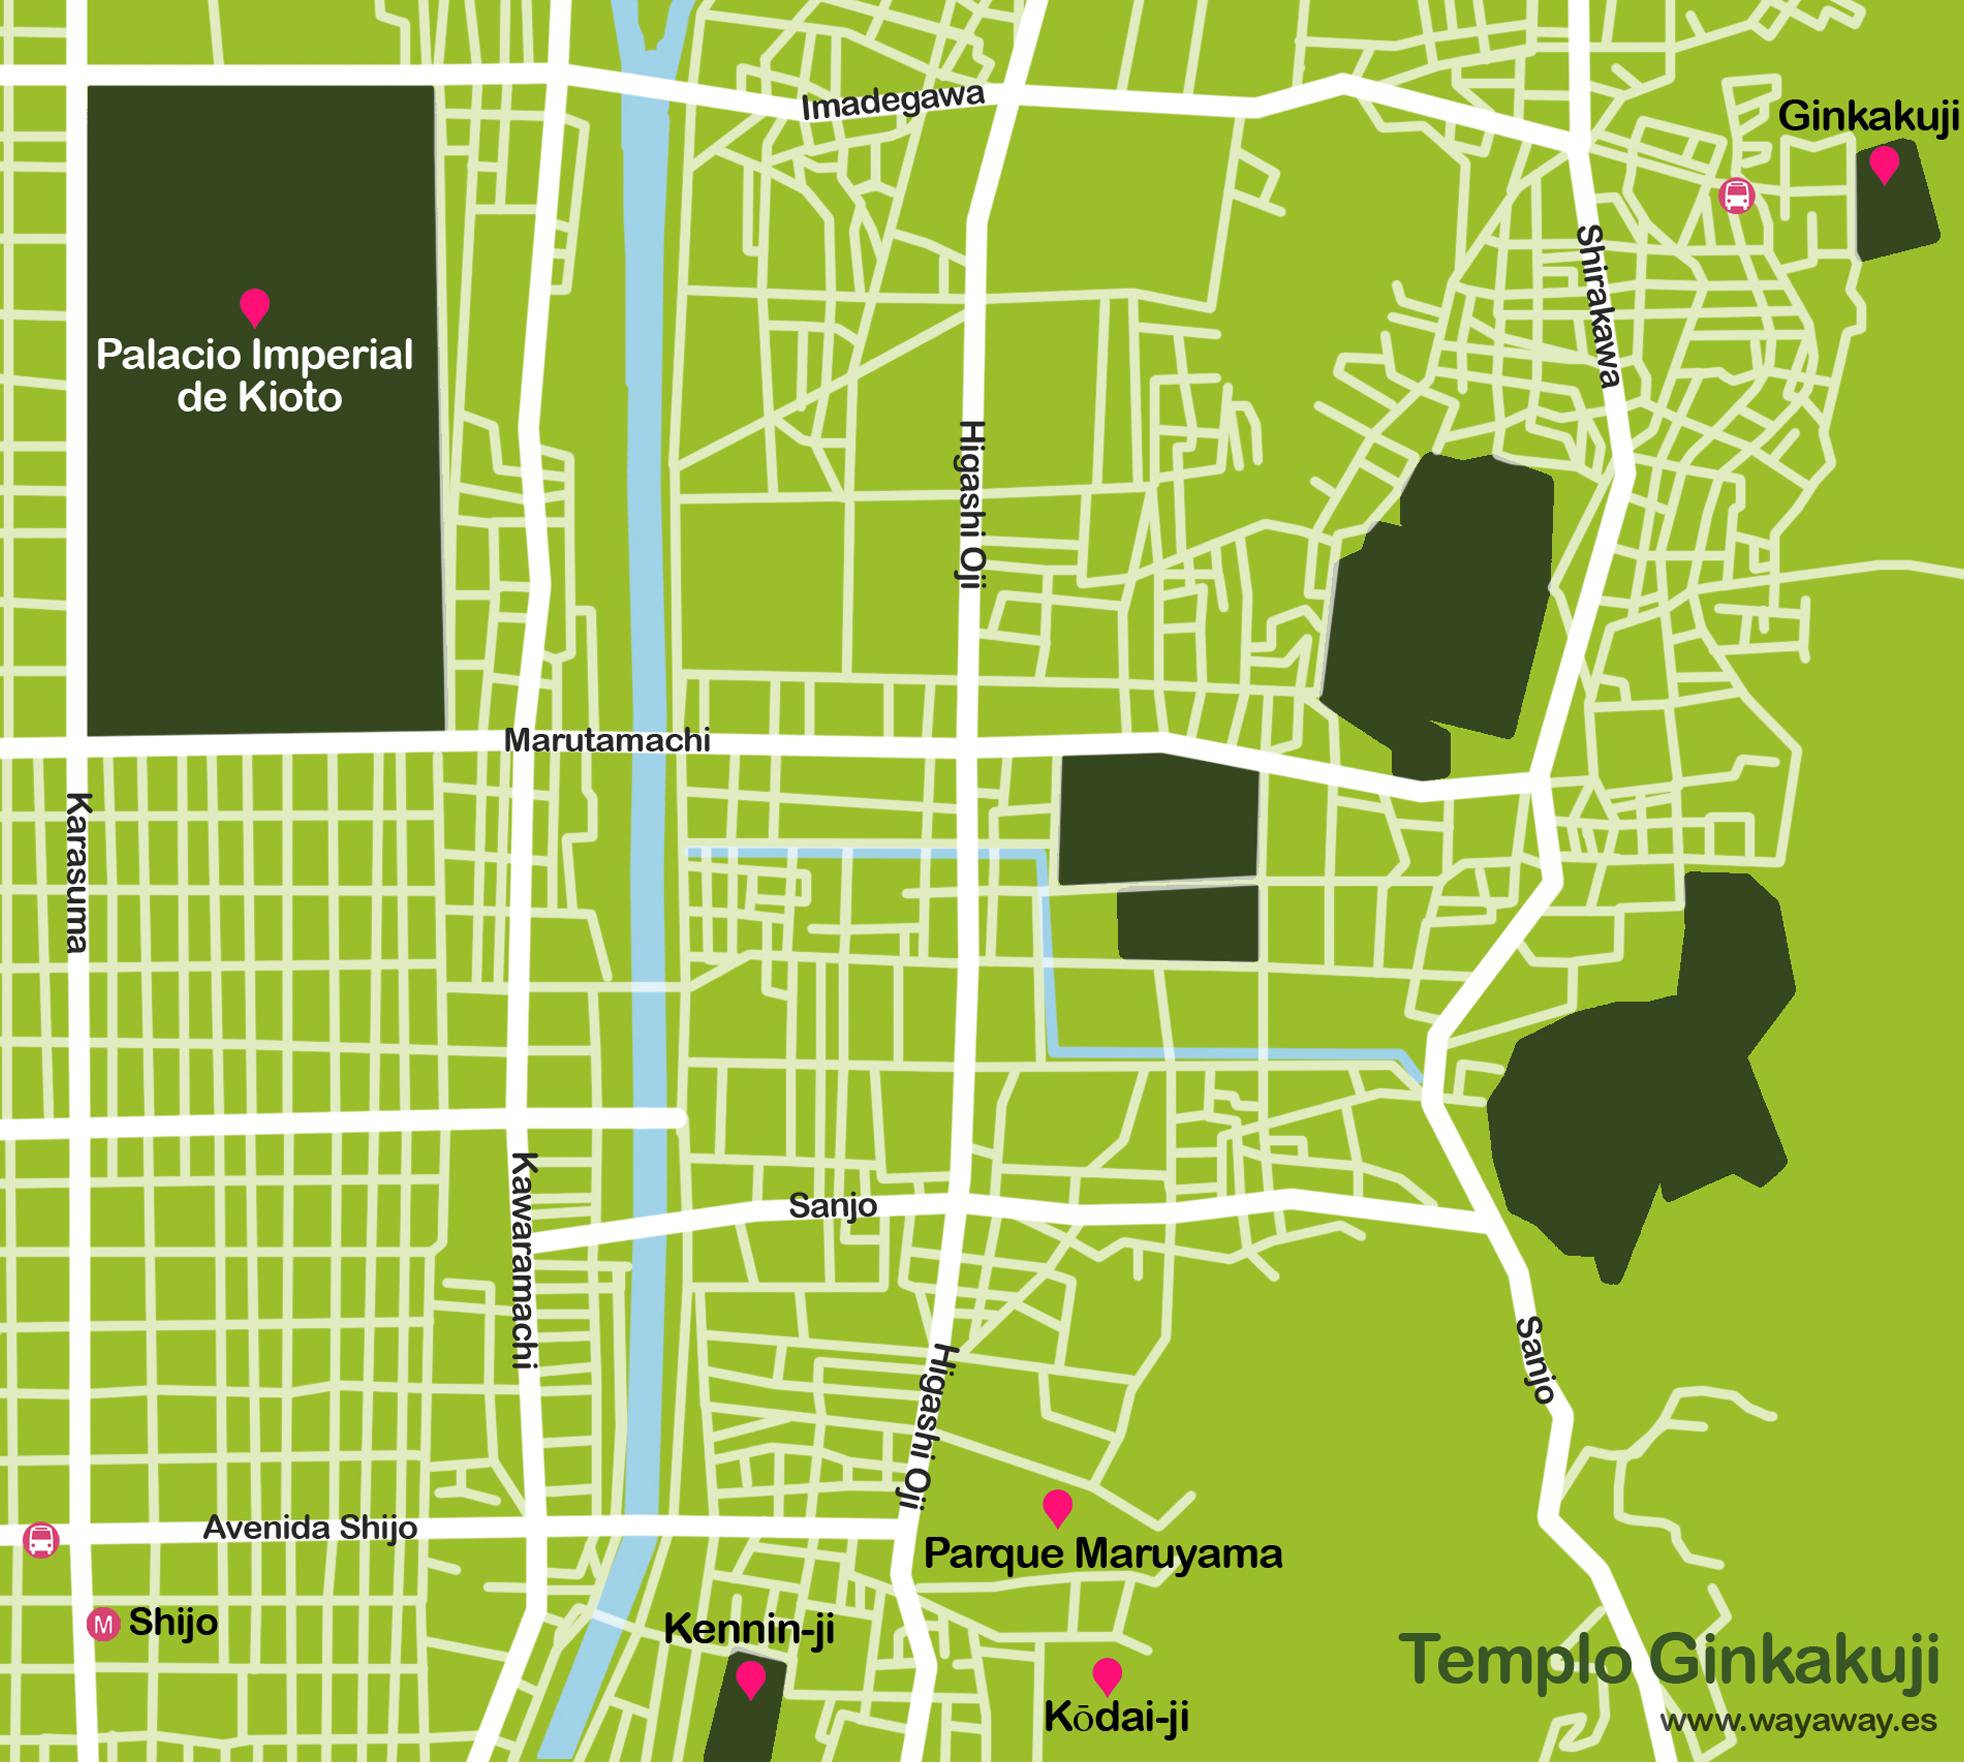 Mapa de Kioto: templo Ginkakuji #onlyes